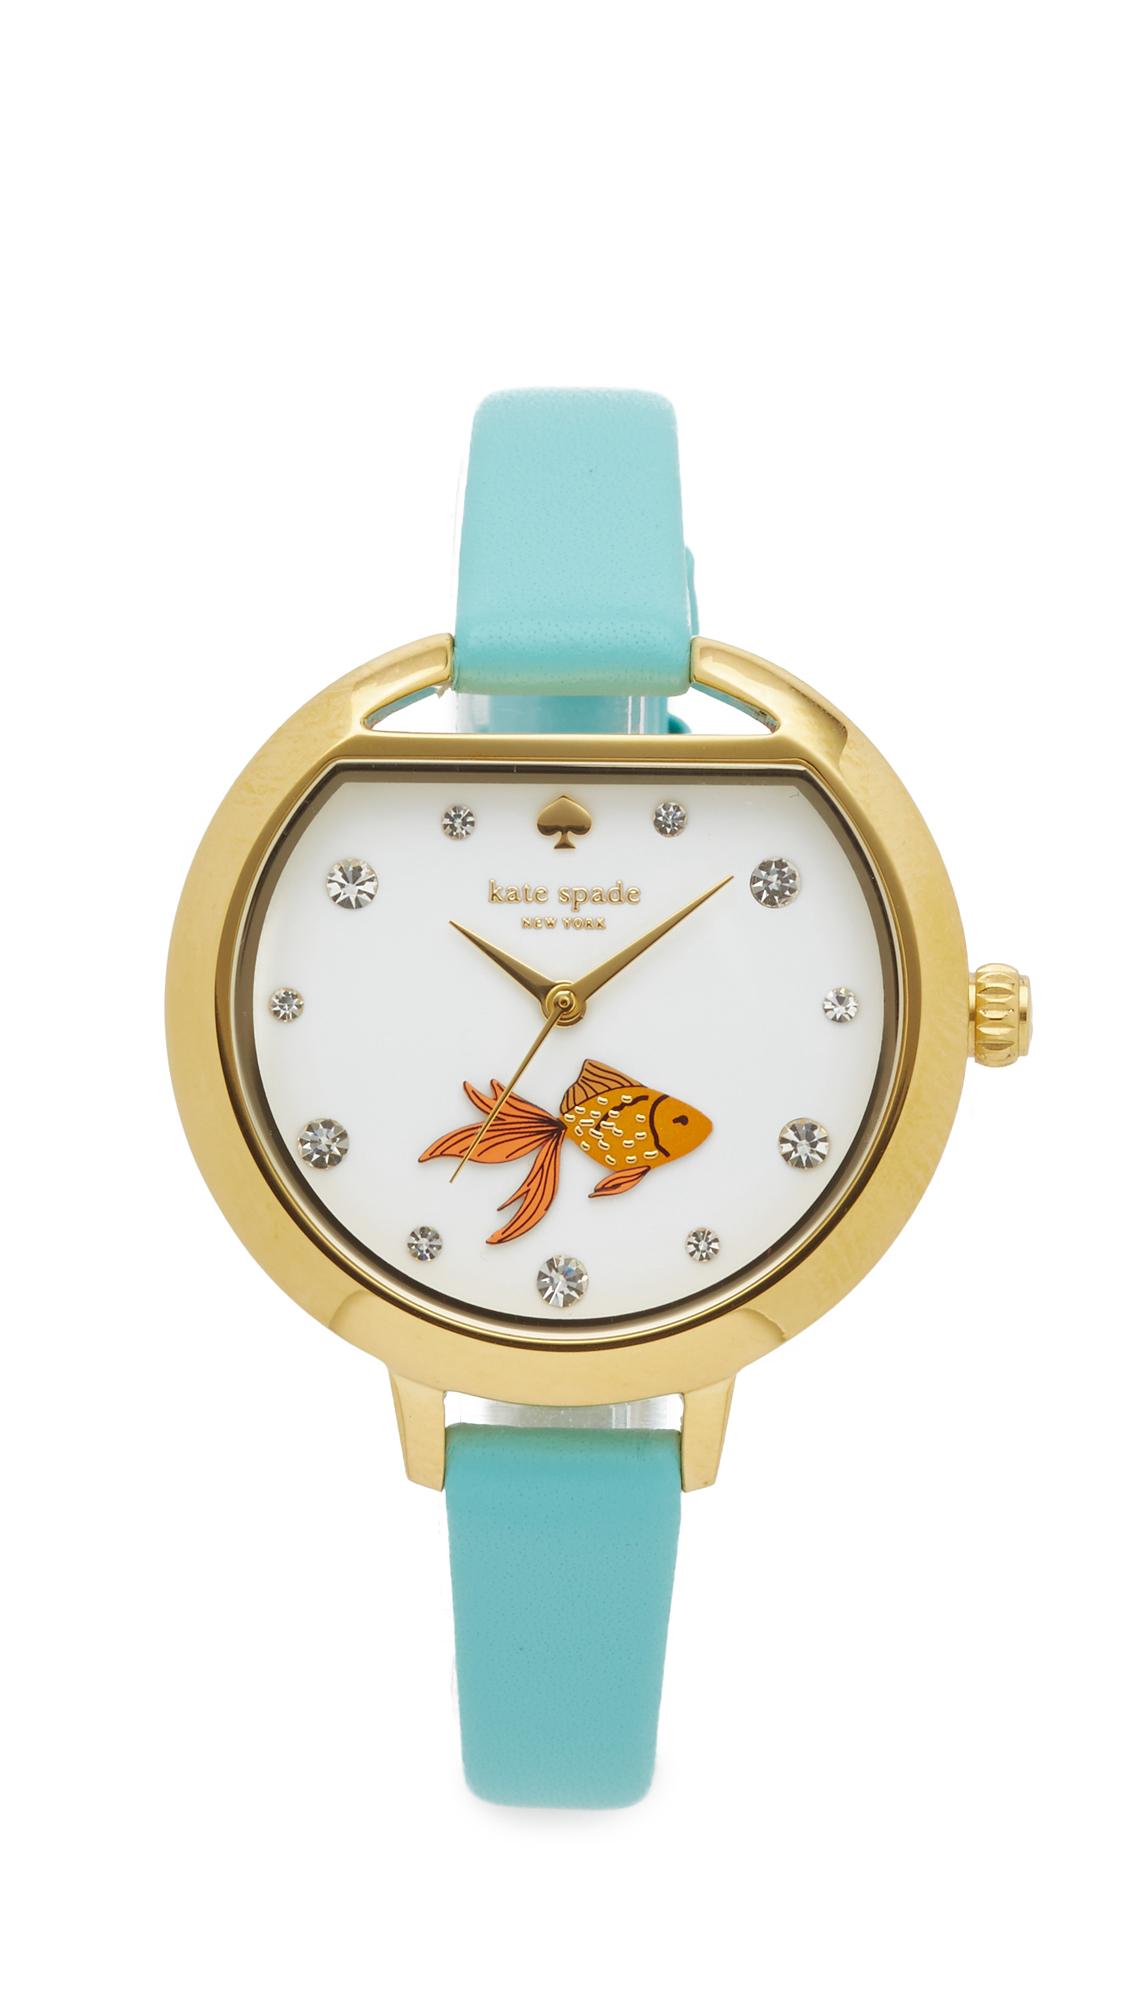 6050547ce Kate Spade Novelty Watch - Lyst